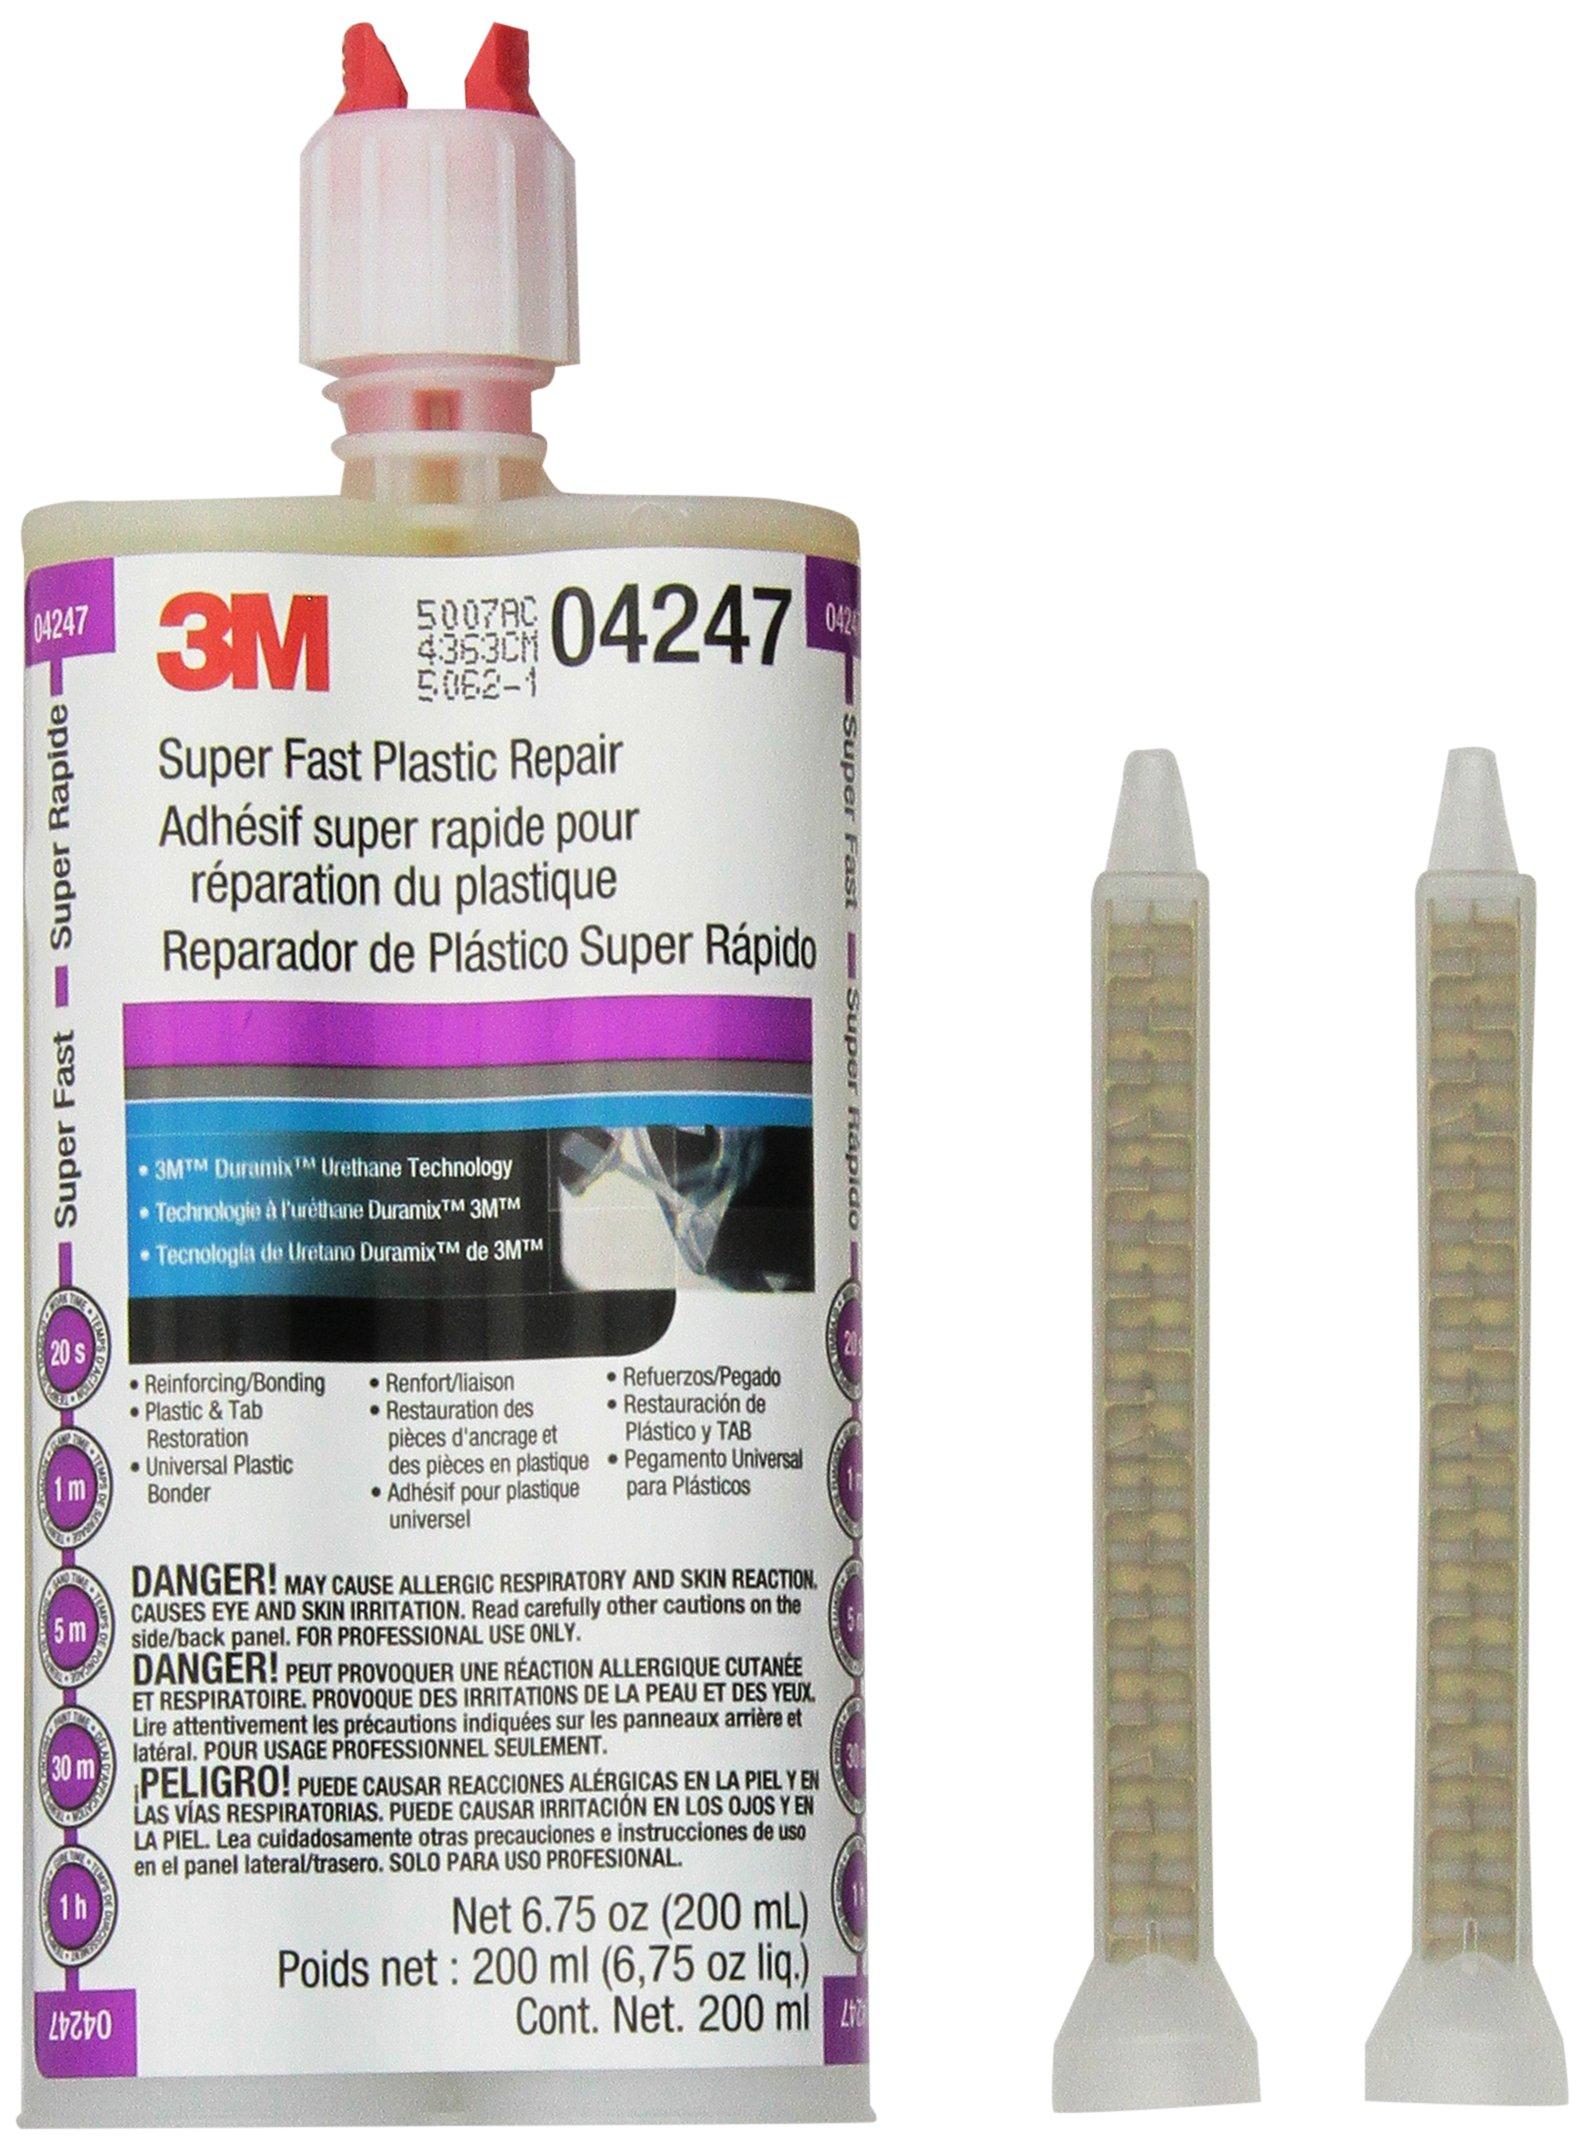 3M 04247 Super Fast Plastic Repair - 200 ml by 3M